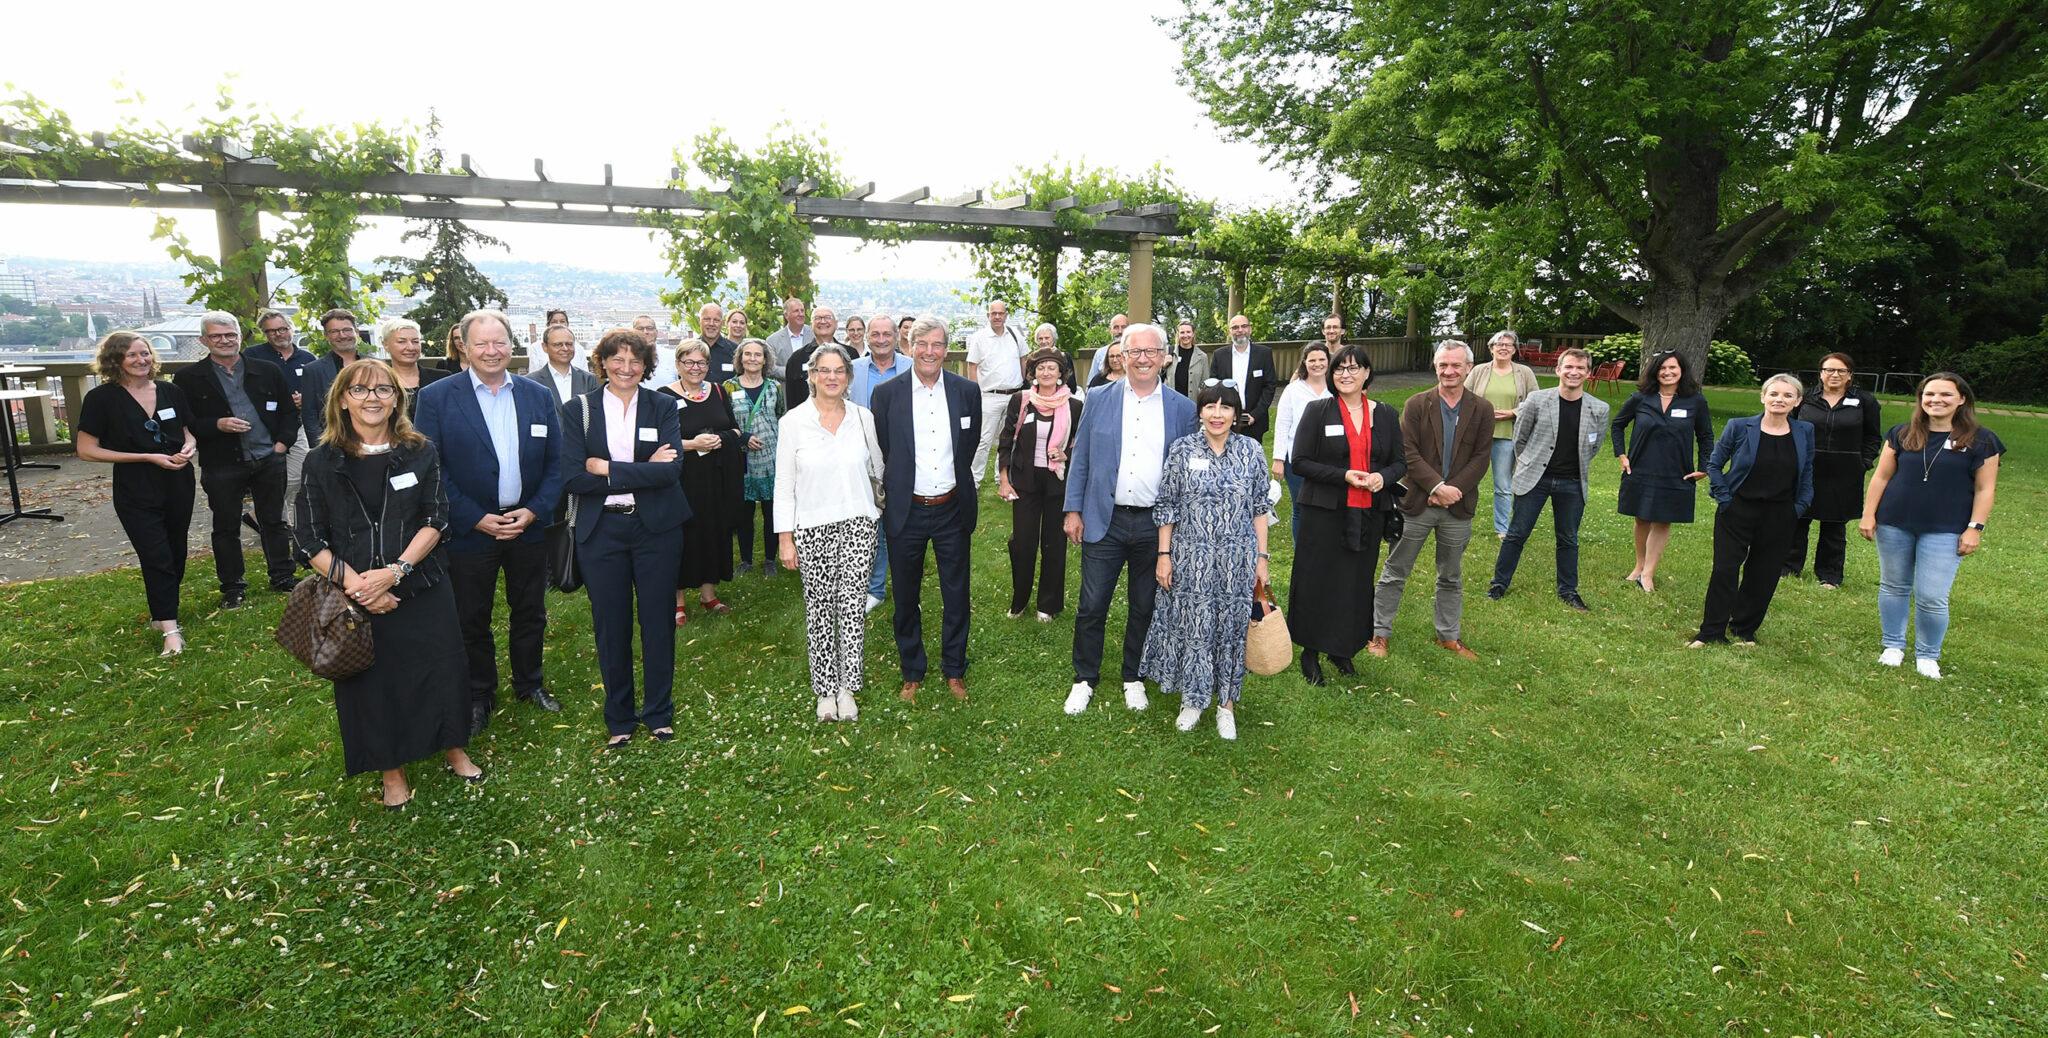 Teilnehmende der Gründungsveranstaltung der IBA'27 Friends e.V. am 24.06.2021 in Stuttgart (Bild: IBA'27 / F. Kraufmann)